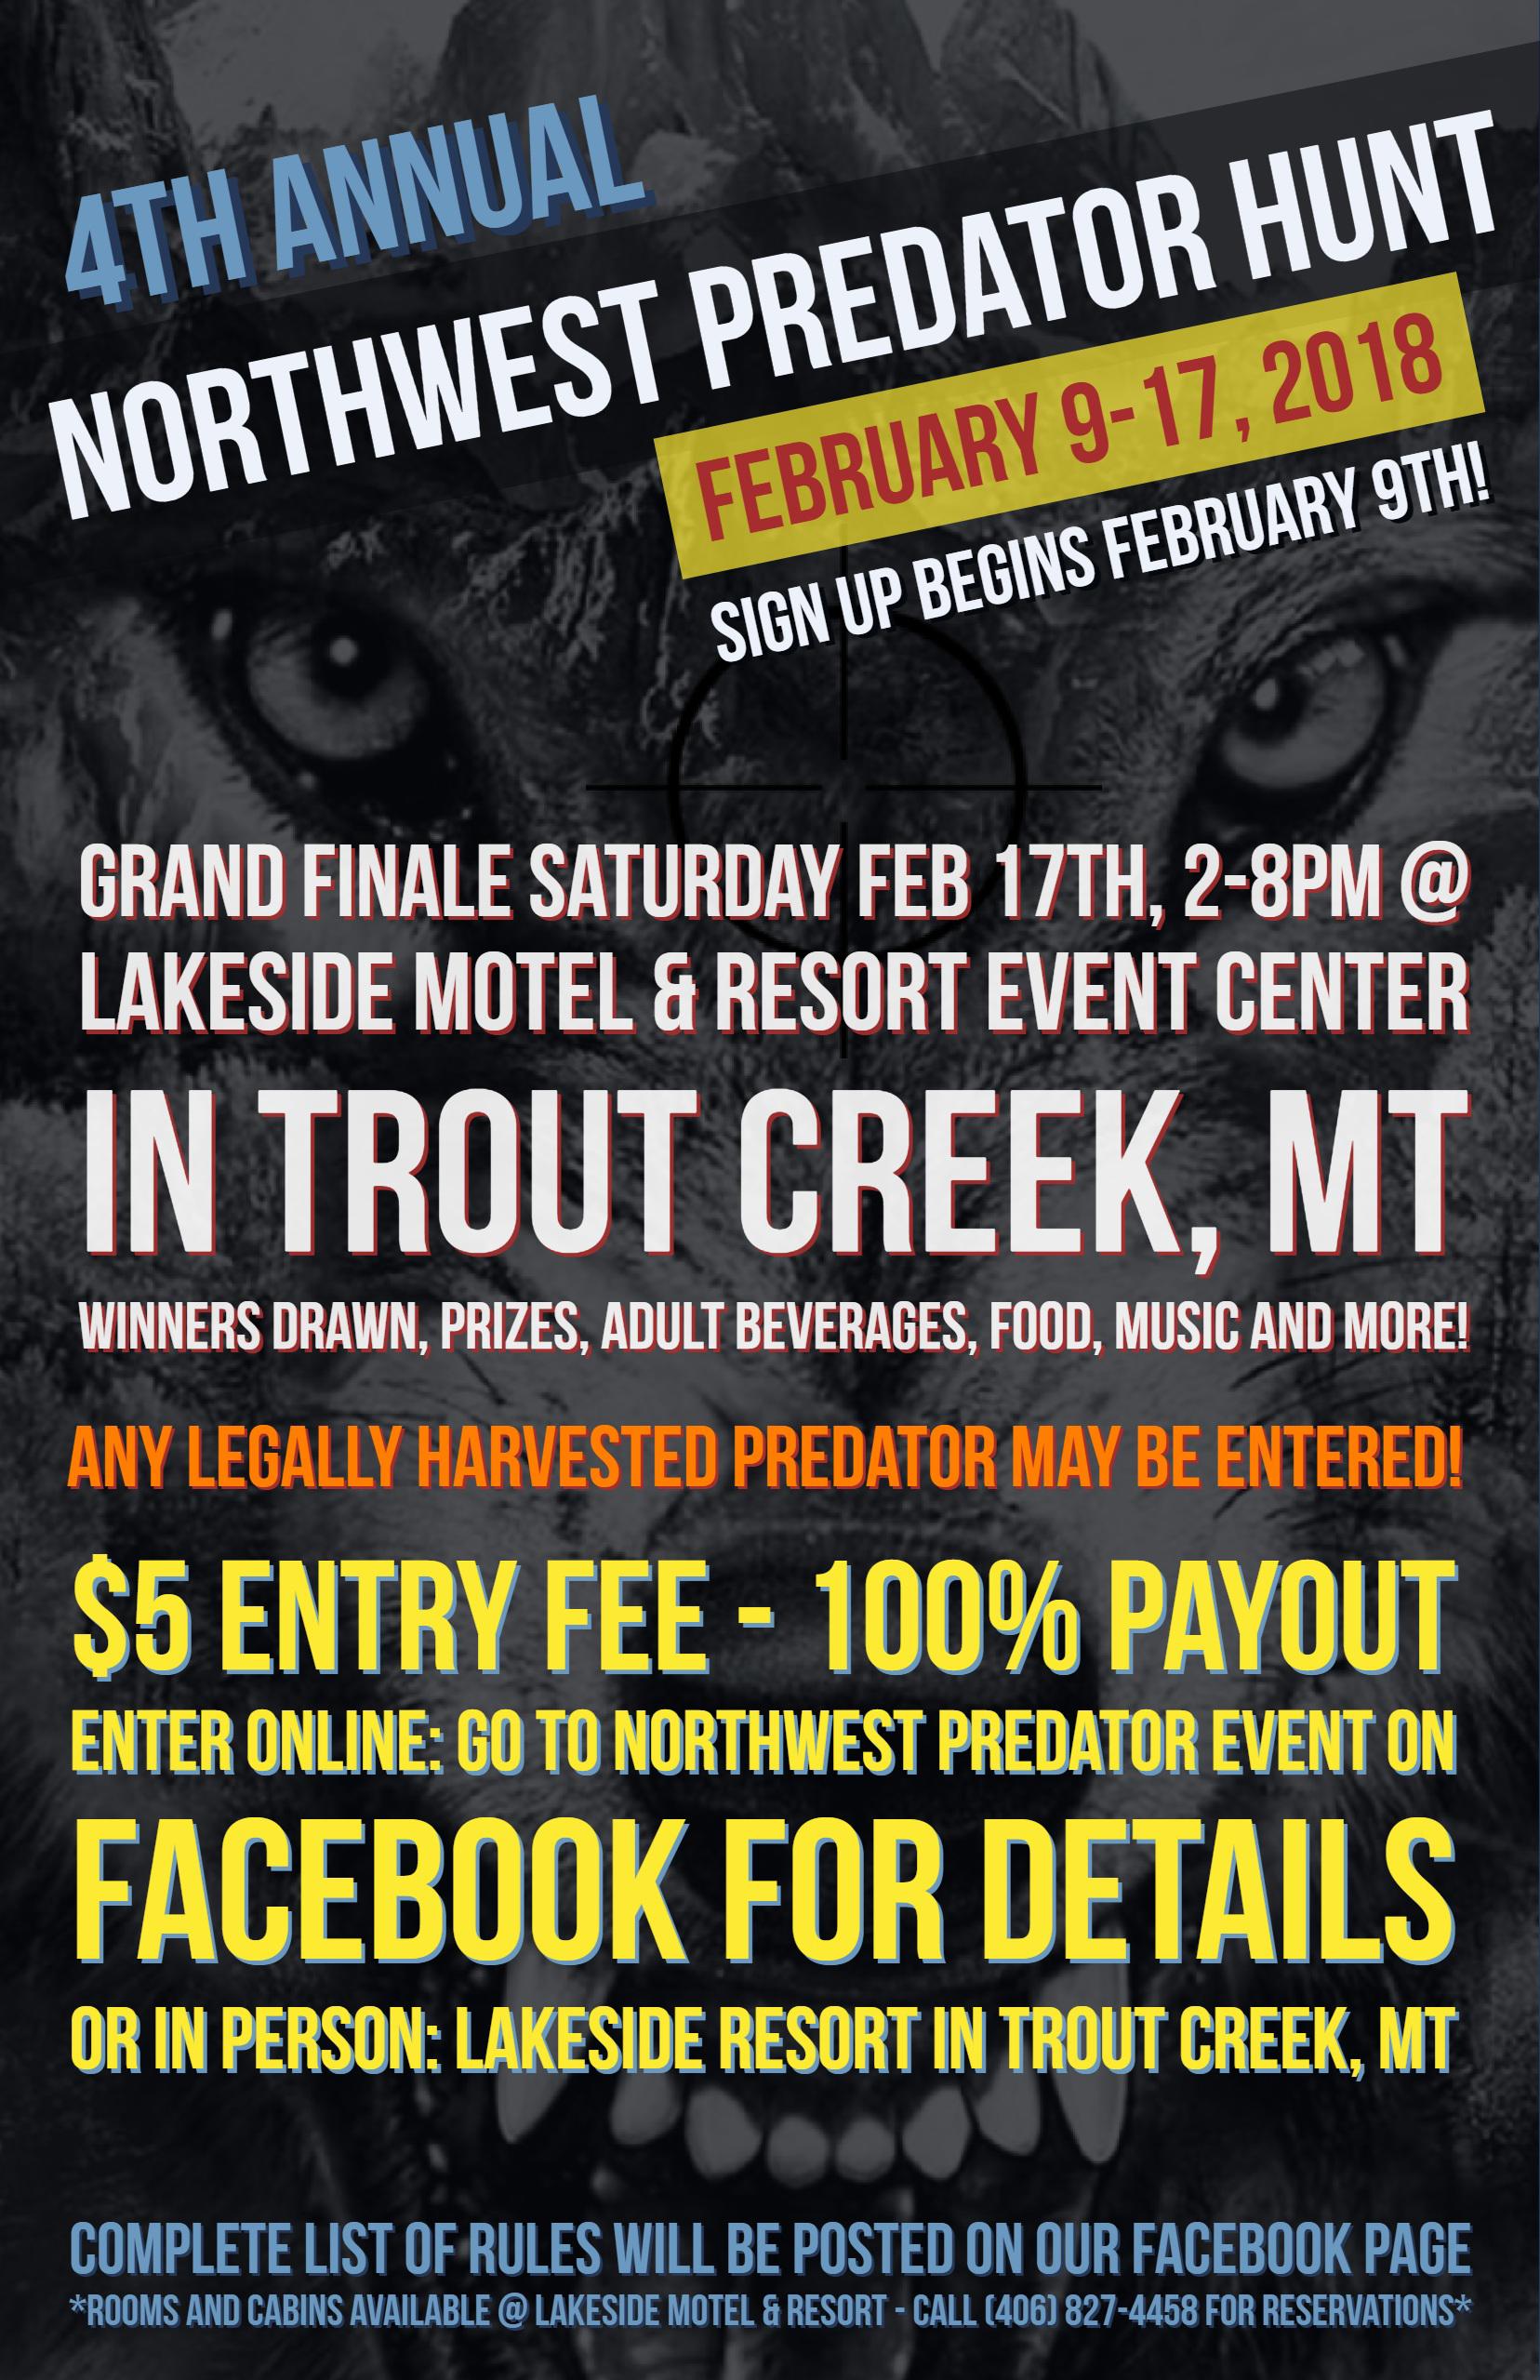 4th Annual NW Predator Hunt in February! | Montana Hunting